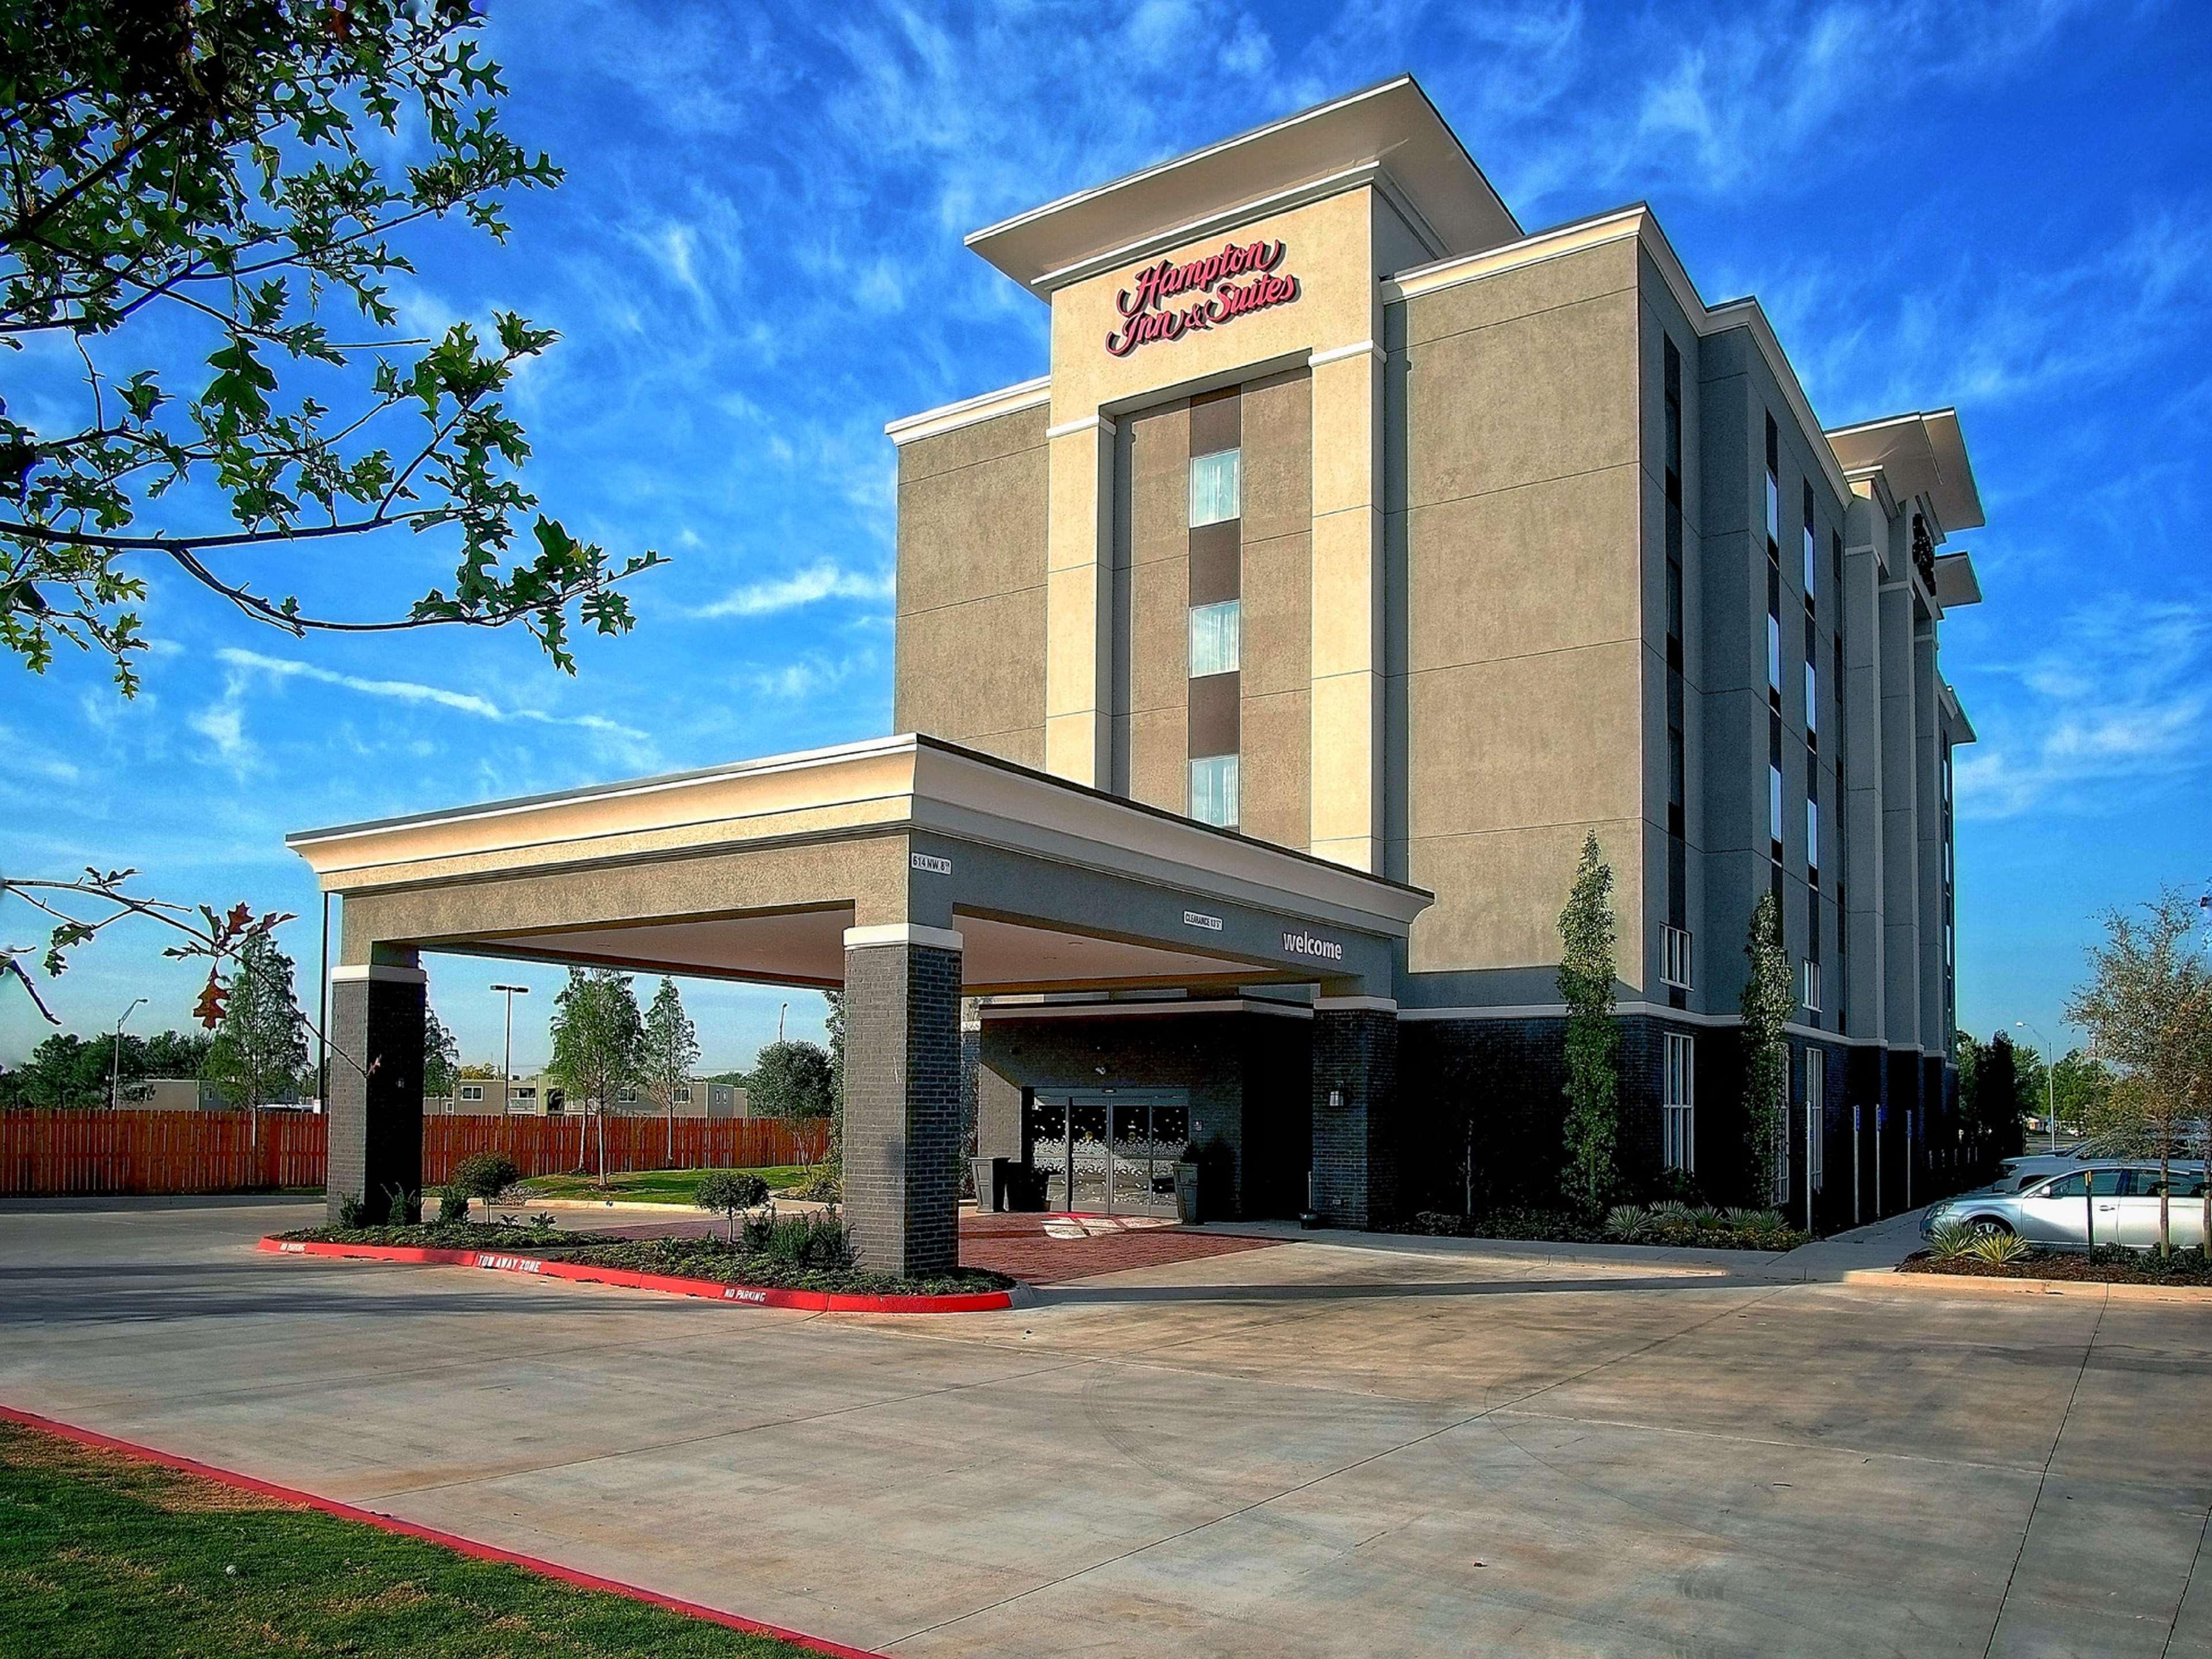 Hampton Inn & Suites Moore, OK, Cleveland